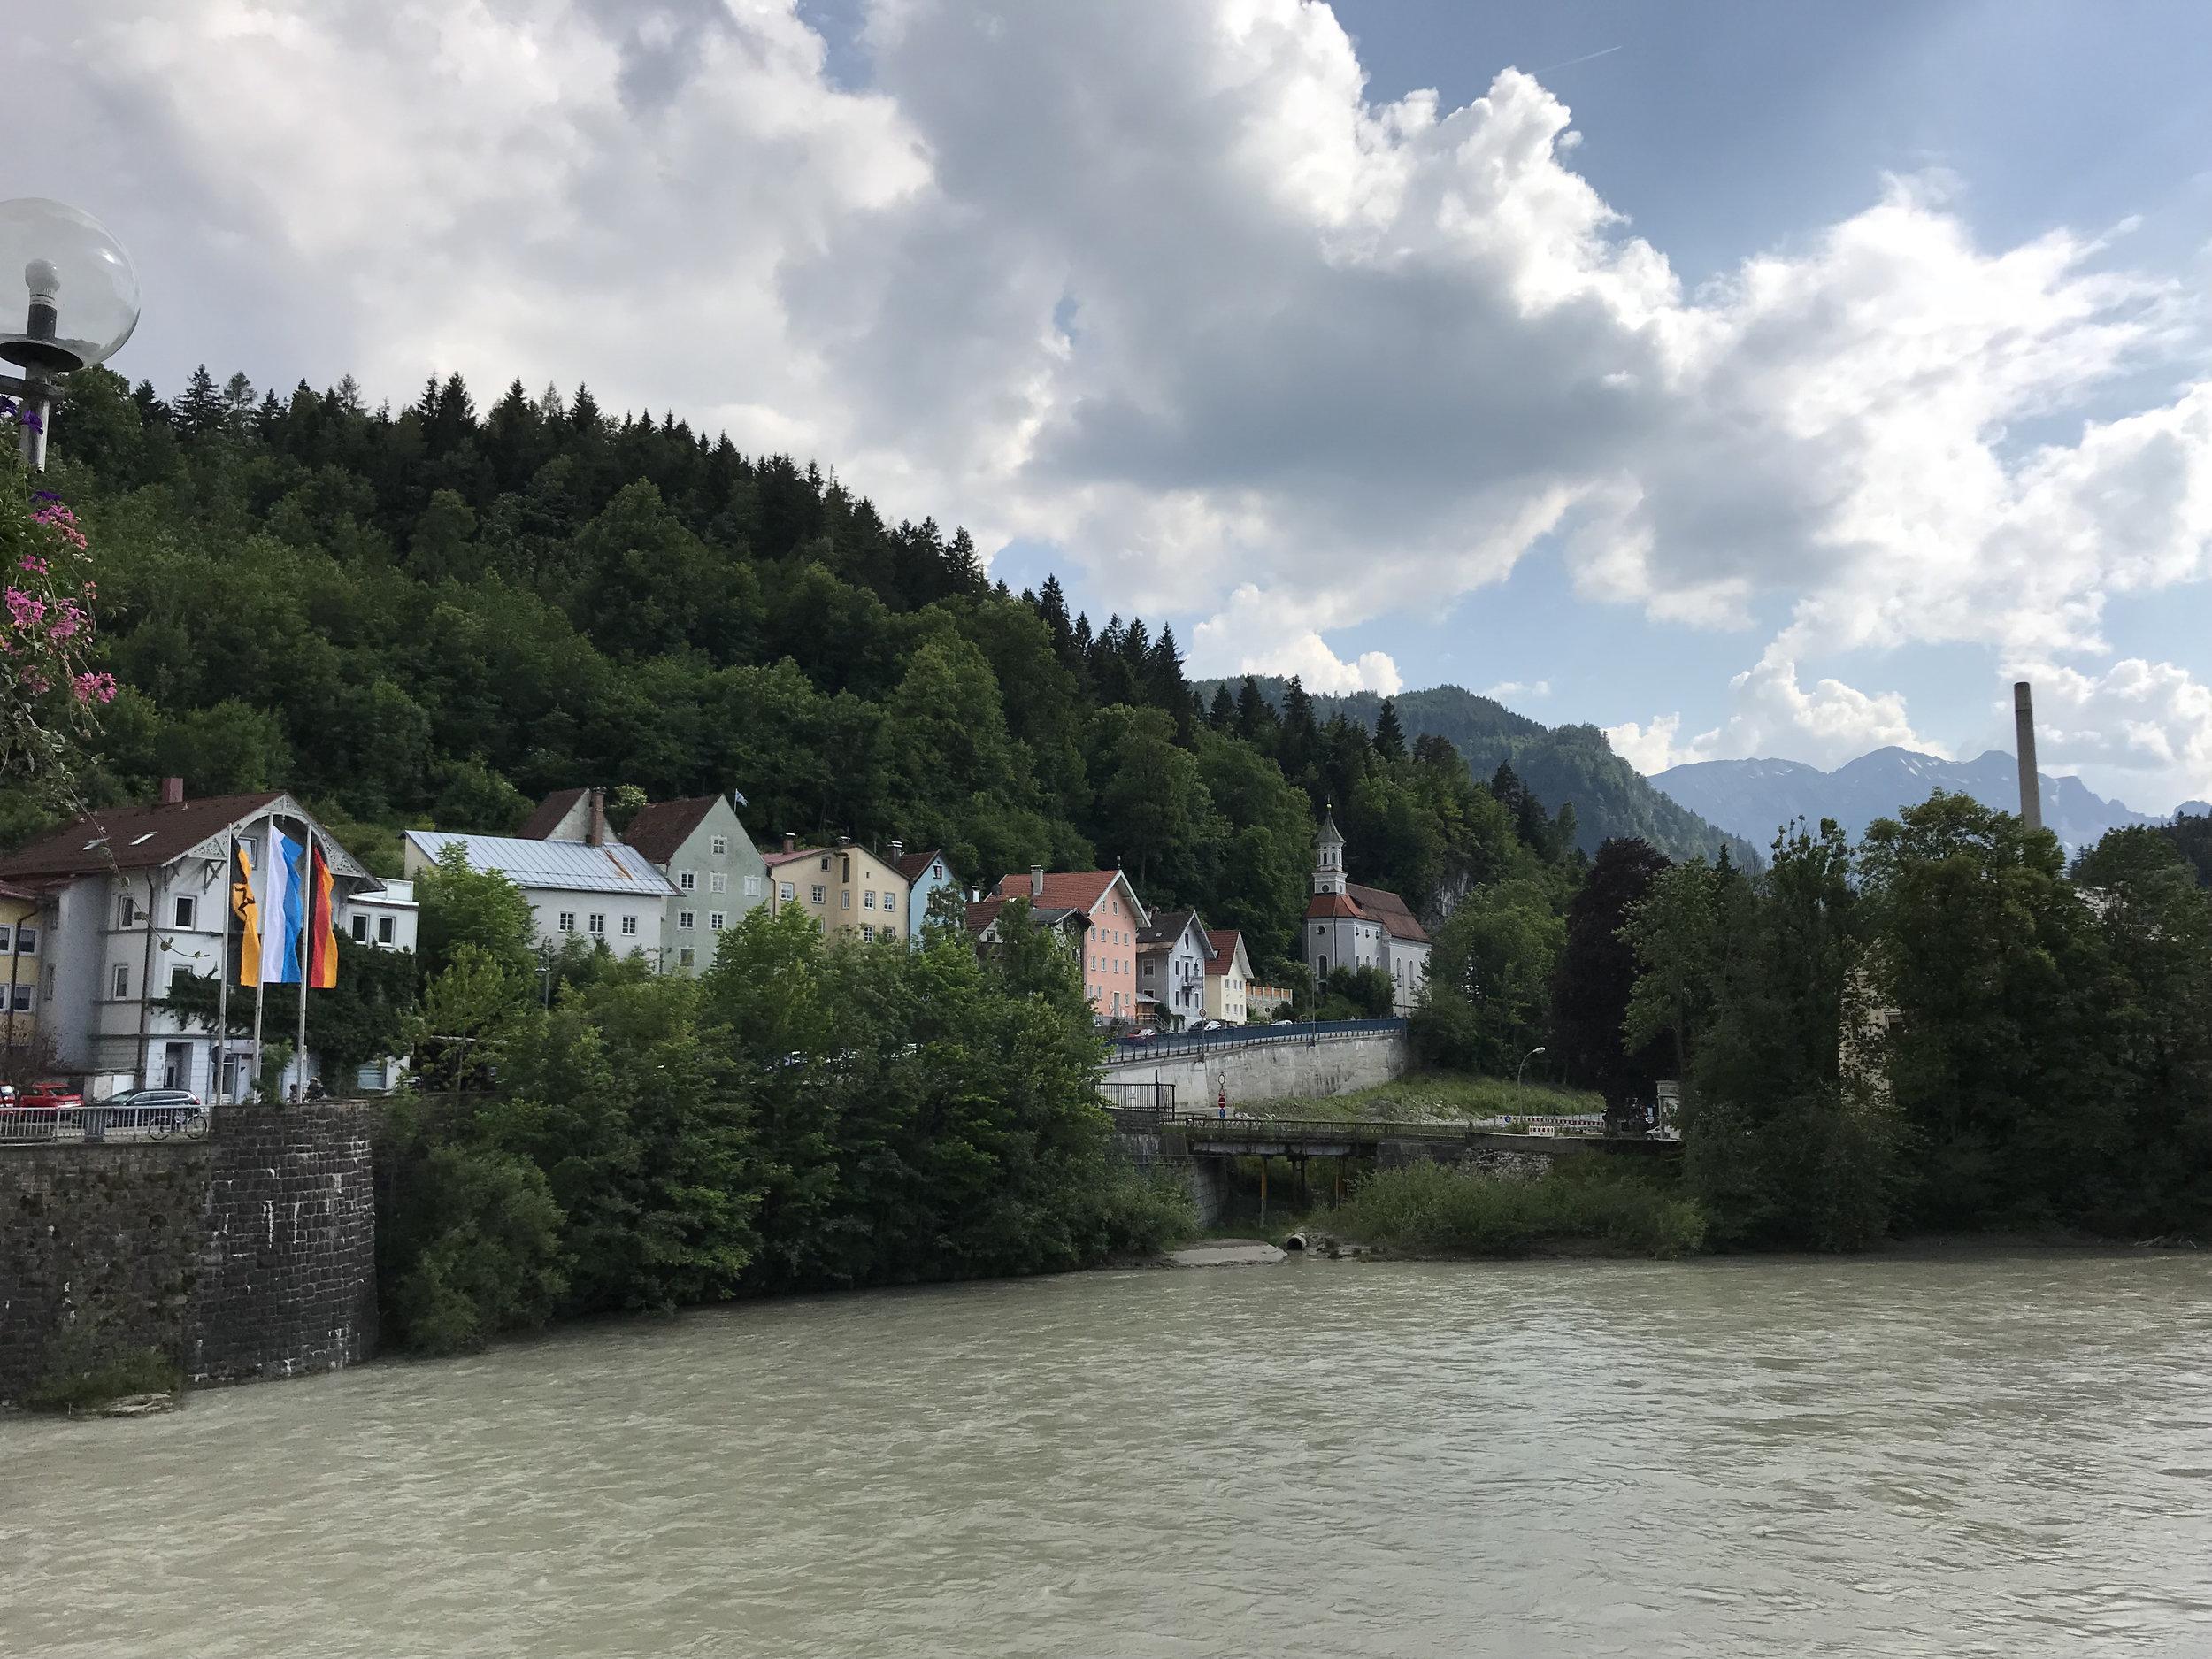 Teri_Day2_Castles_Germany&Austria_spiritedtable_photo05.jpg